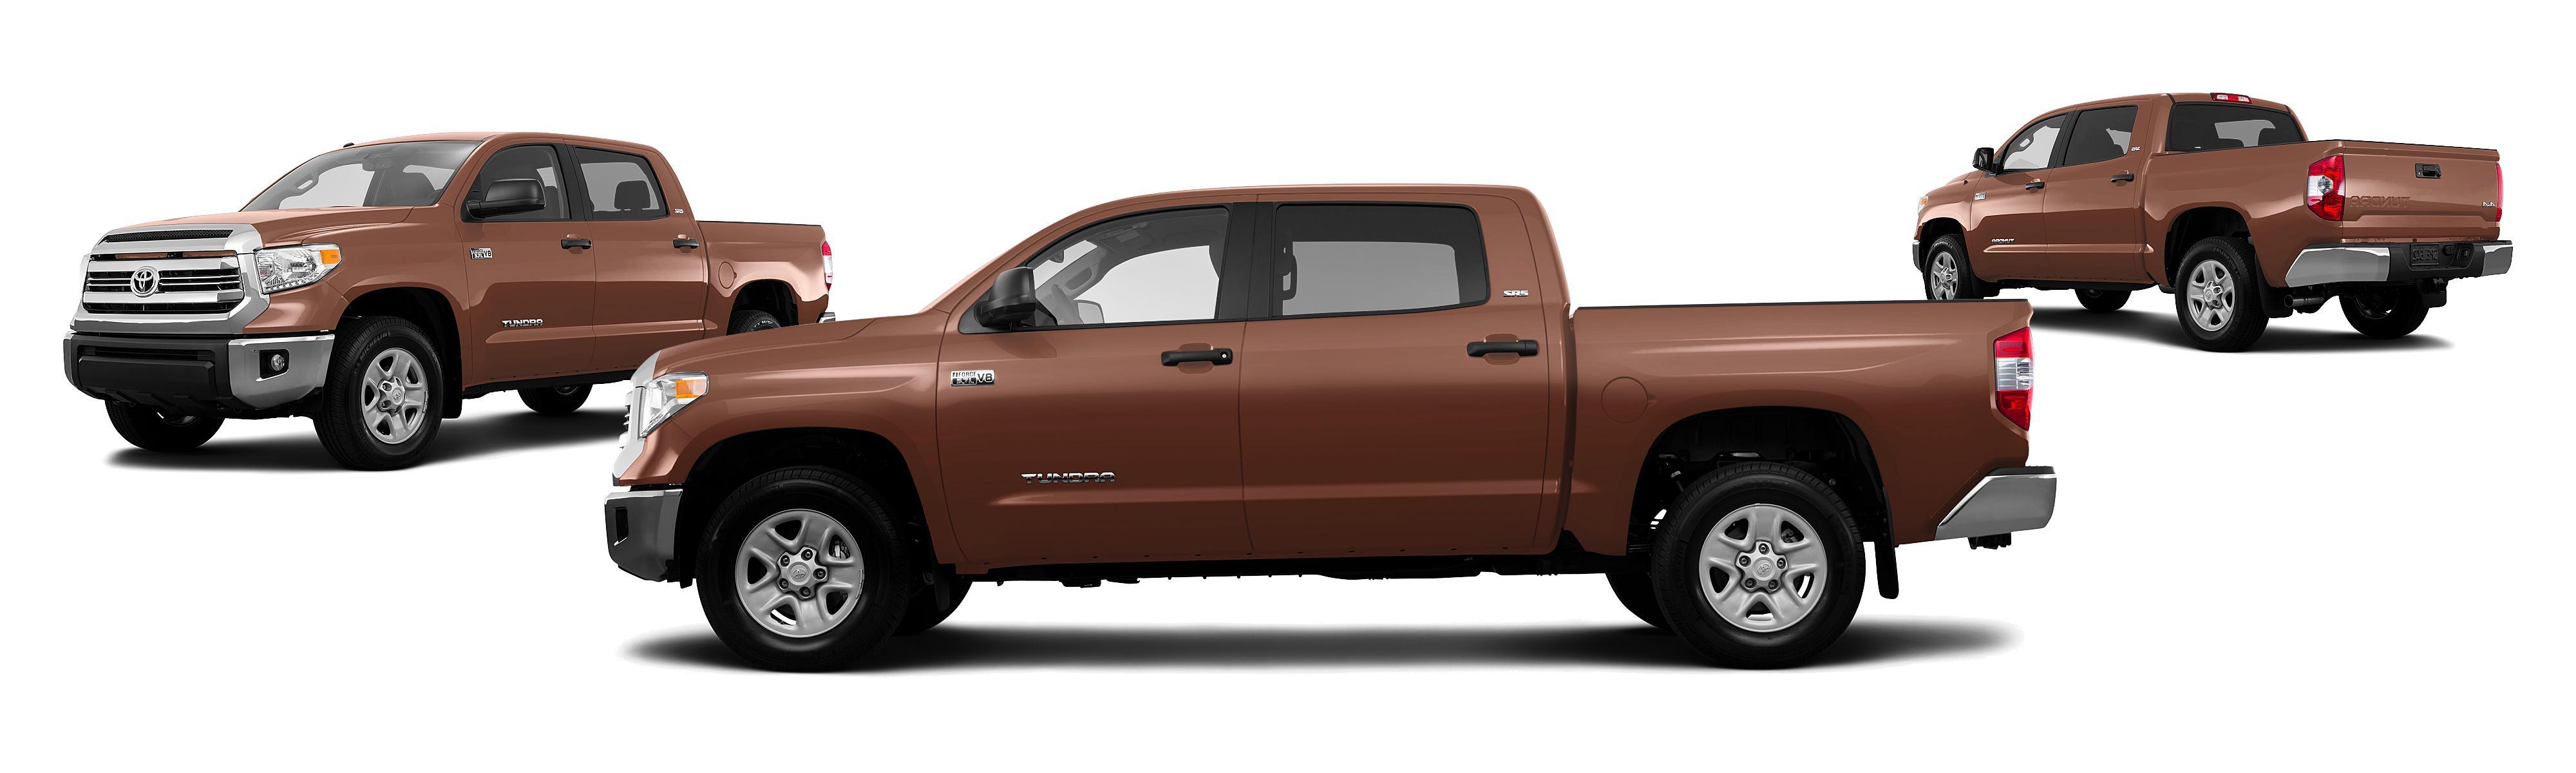 2017 toyota tundra 4x4 sr5 4dr crewmax cab pickup sb 57l v8 toyota tundra invoice price